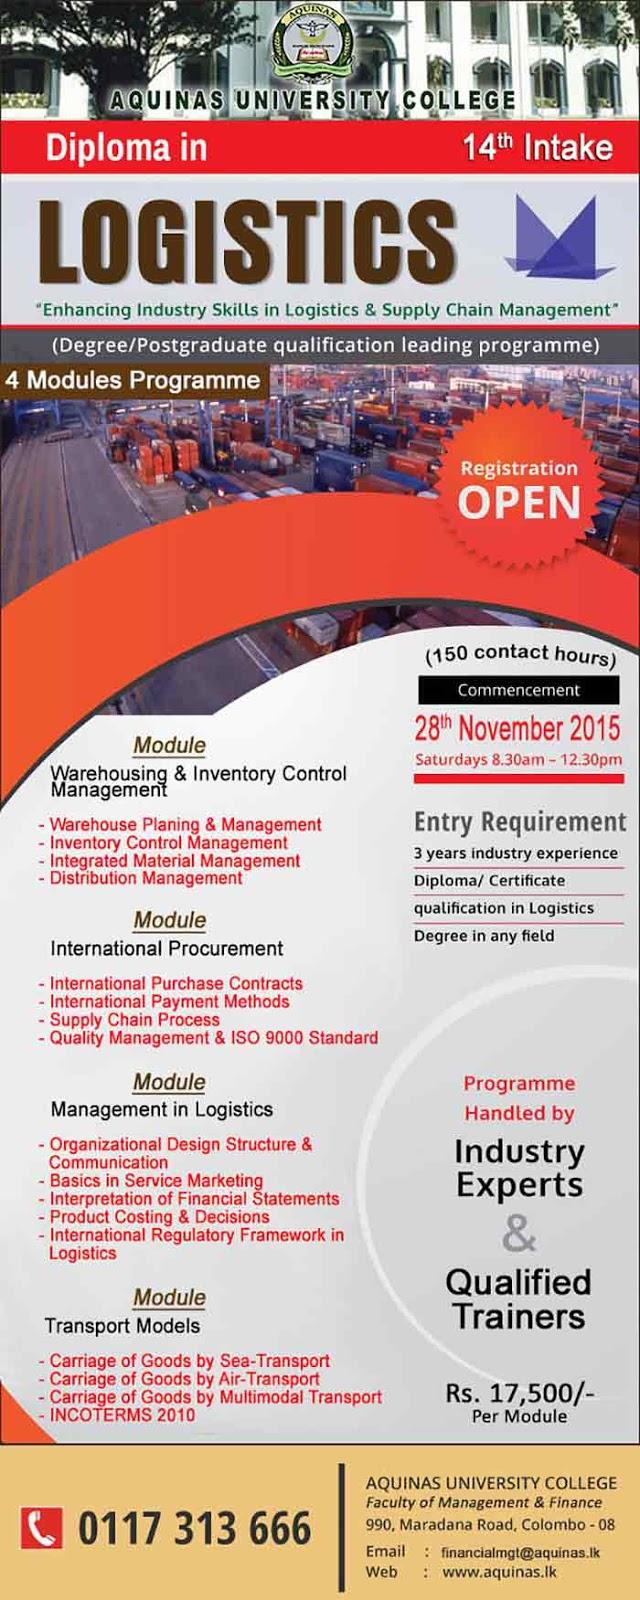 Diploma in Logistics - 14th Intake